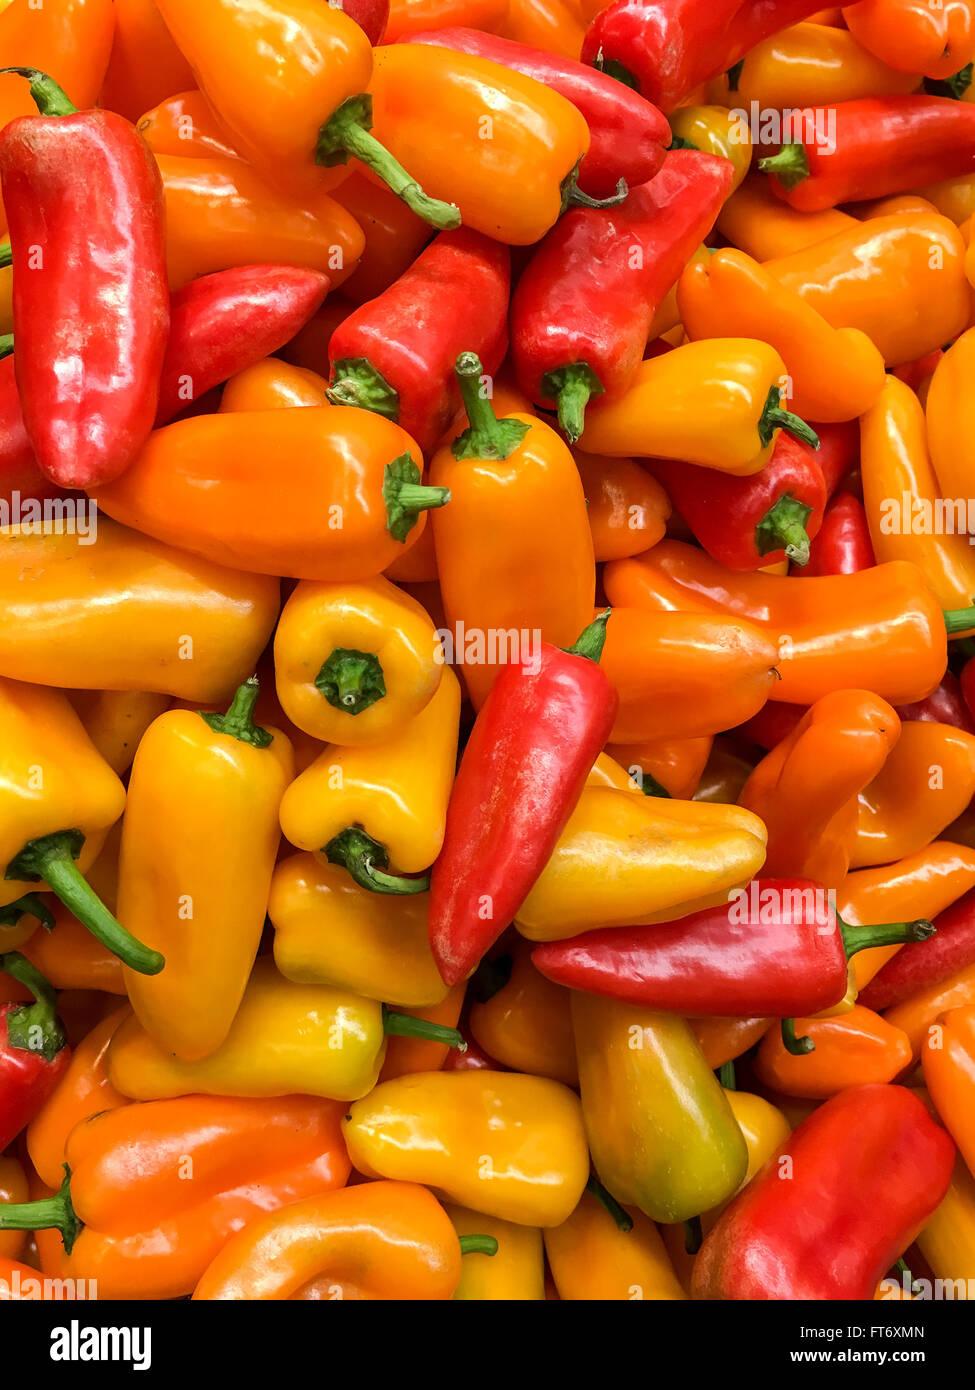 Red And Orange Capsicum In Vegetable Market Display - Stock Image